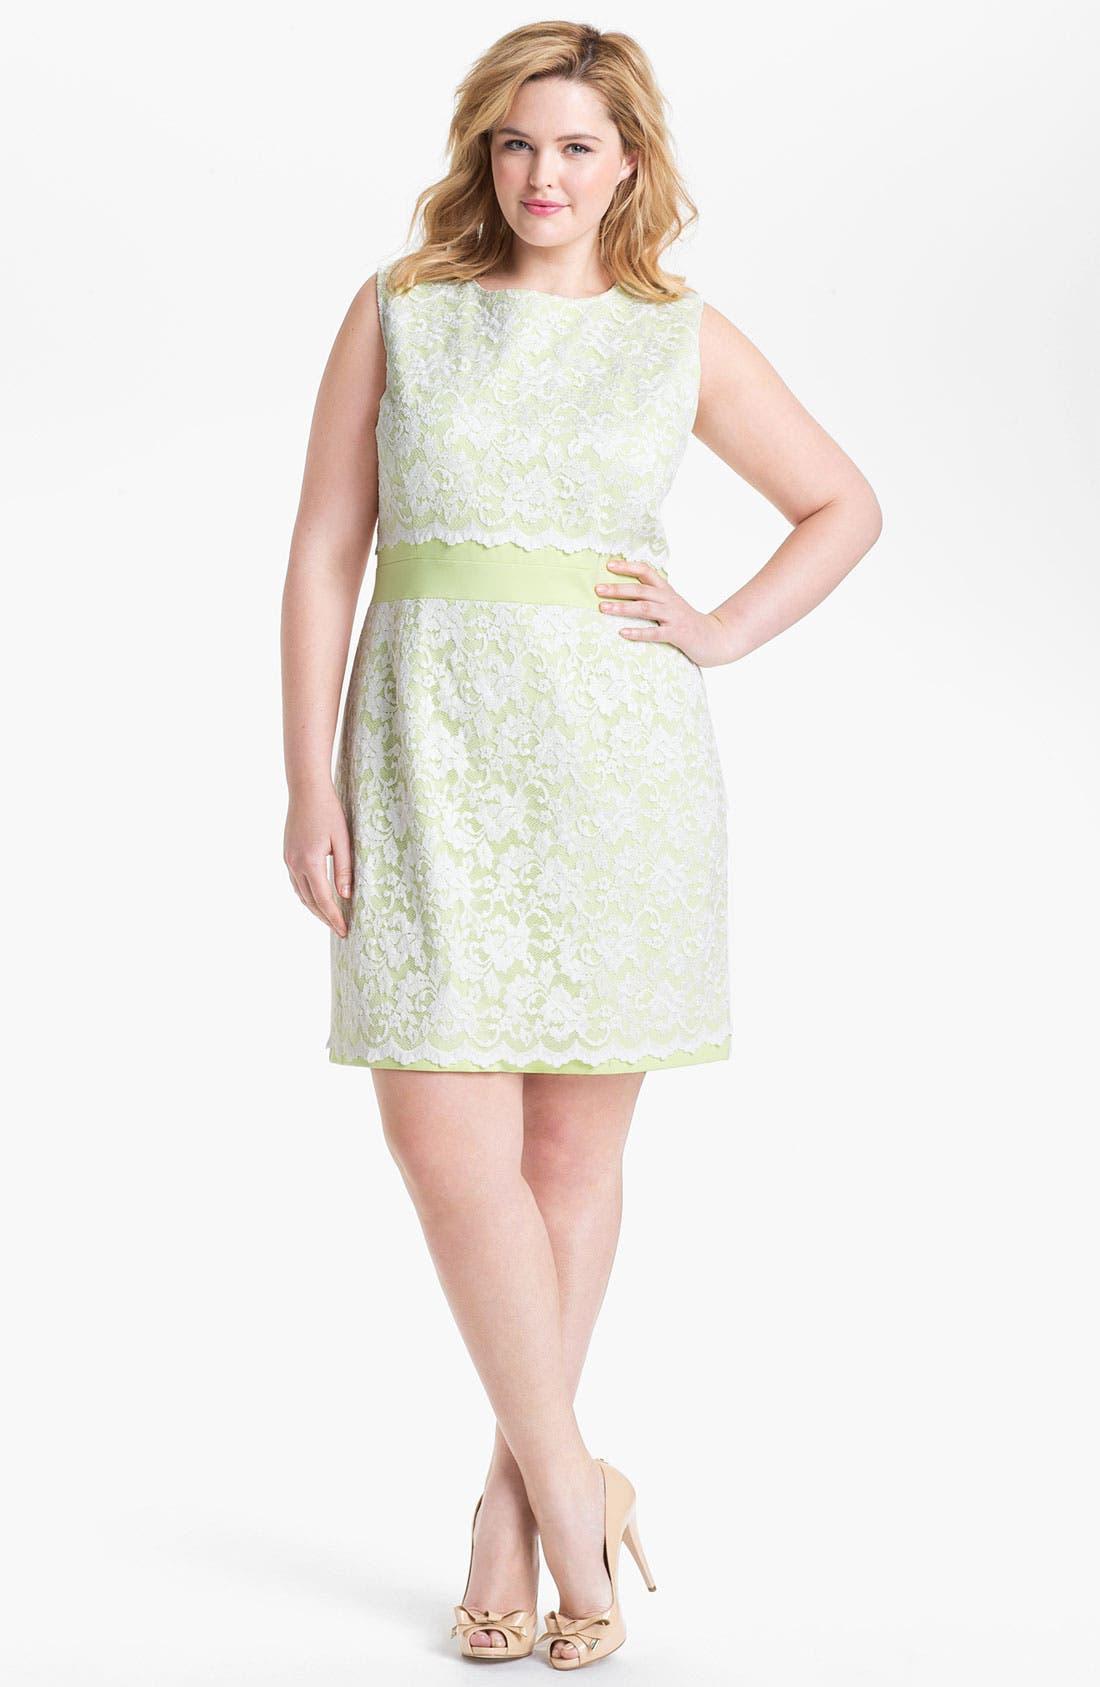 Alternate Image 1 Selected - ABS by Allen Schwartz Lace Front Sheath Dress (Plus Size)